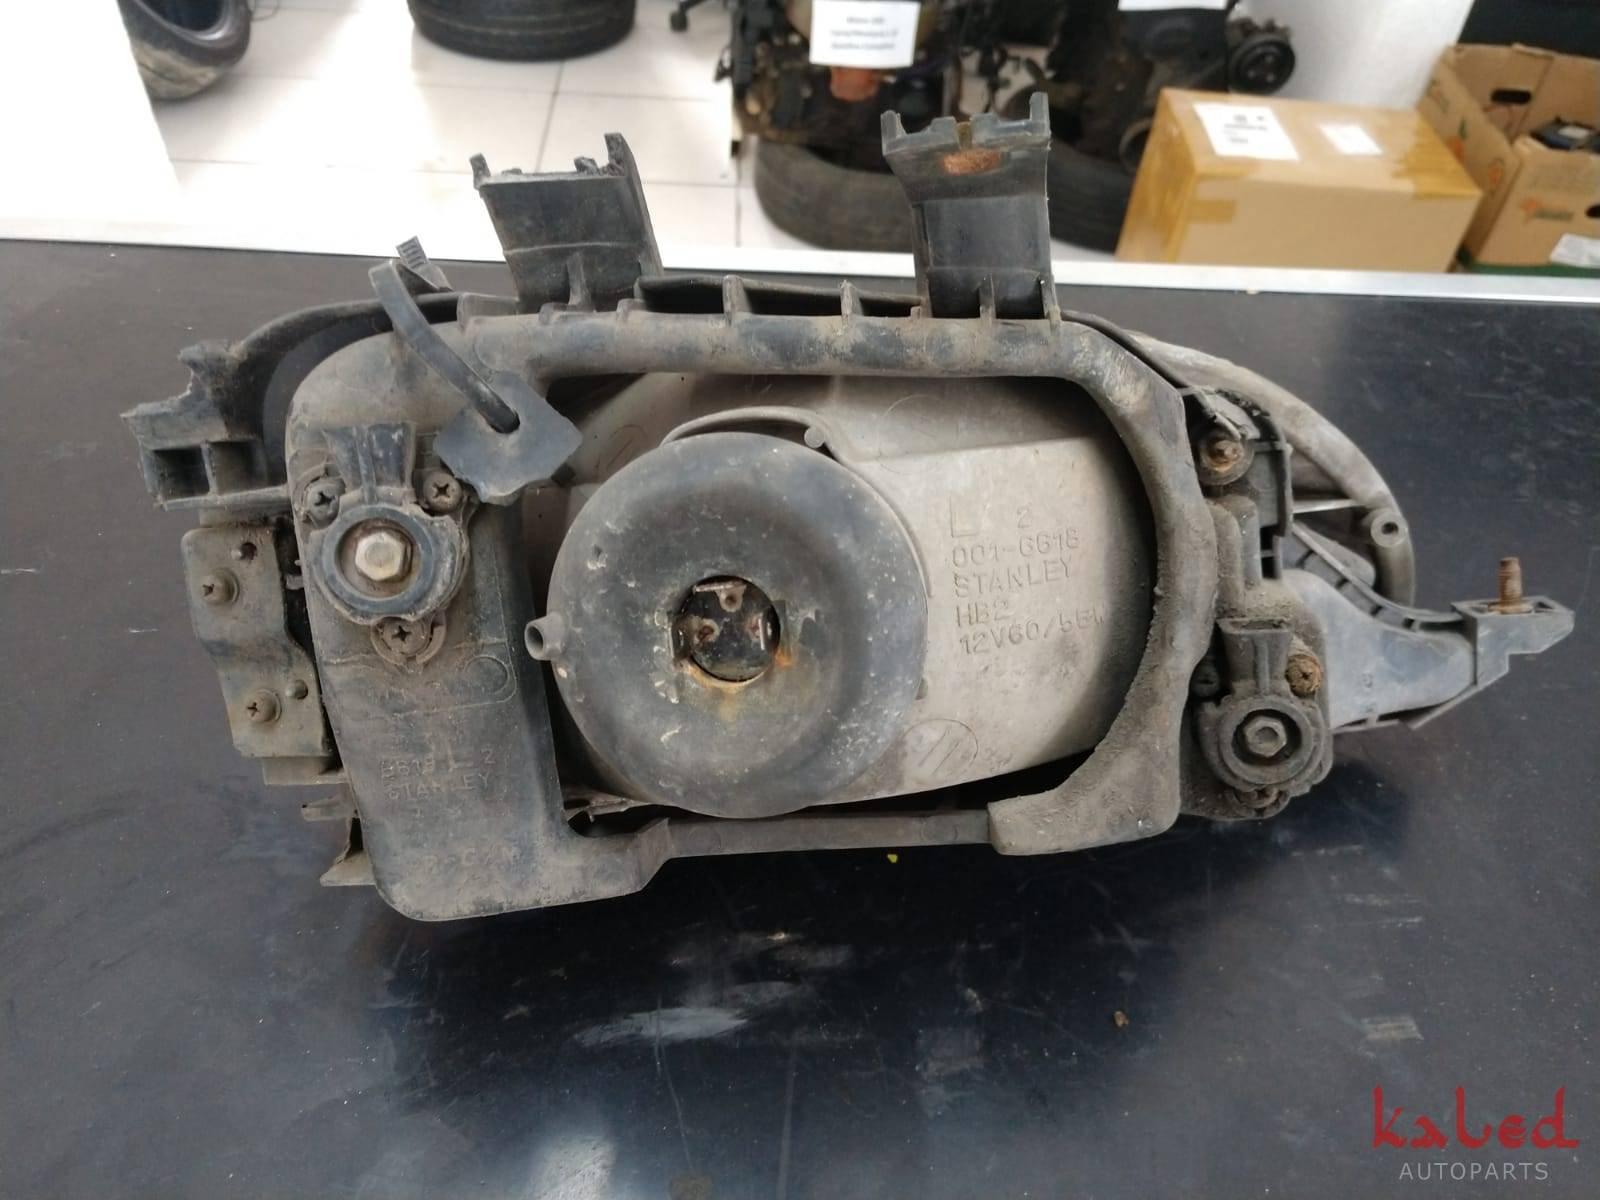 Farol esquerdo Honda Civic 1992 a 1995 - Kaled Auto Parts